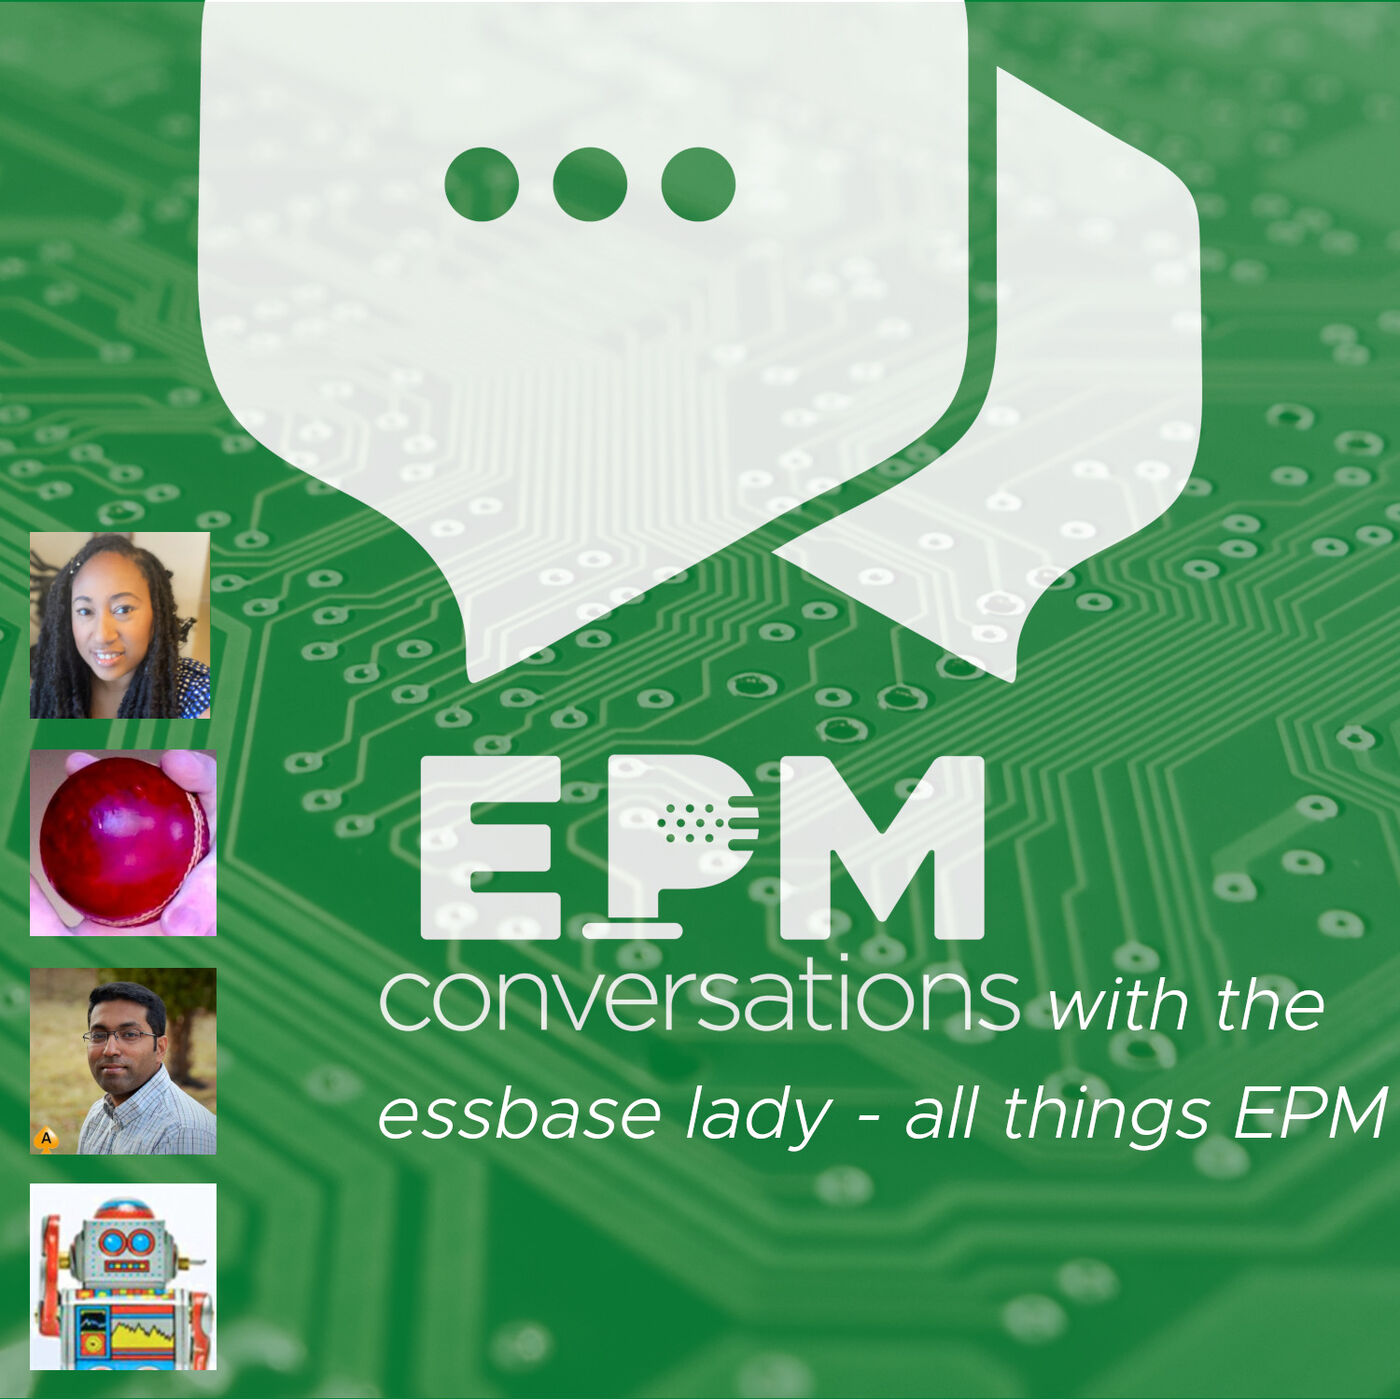 EPM Conversations — Episode No. 2 Part 1, a conversation with Essbase Lady, Natalie Delemar